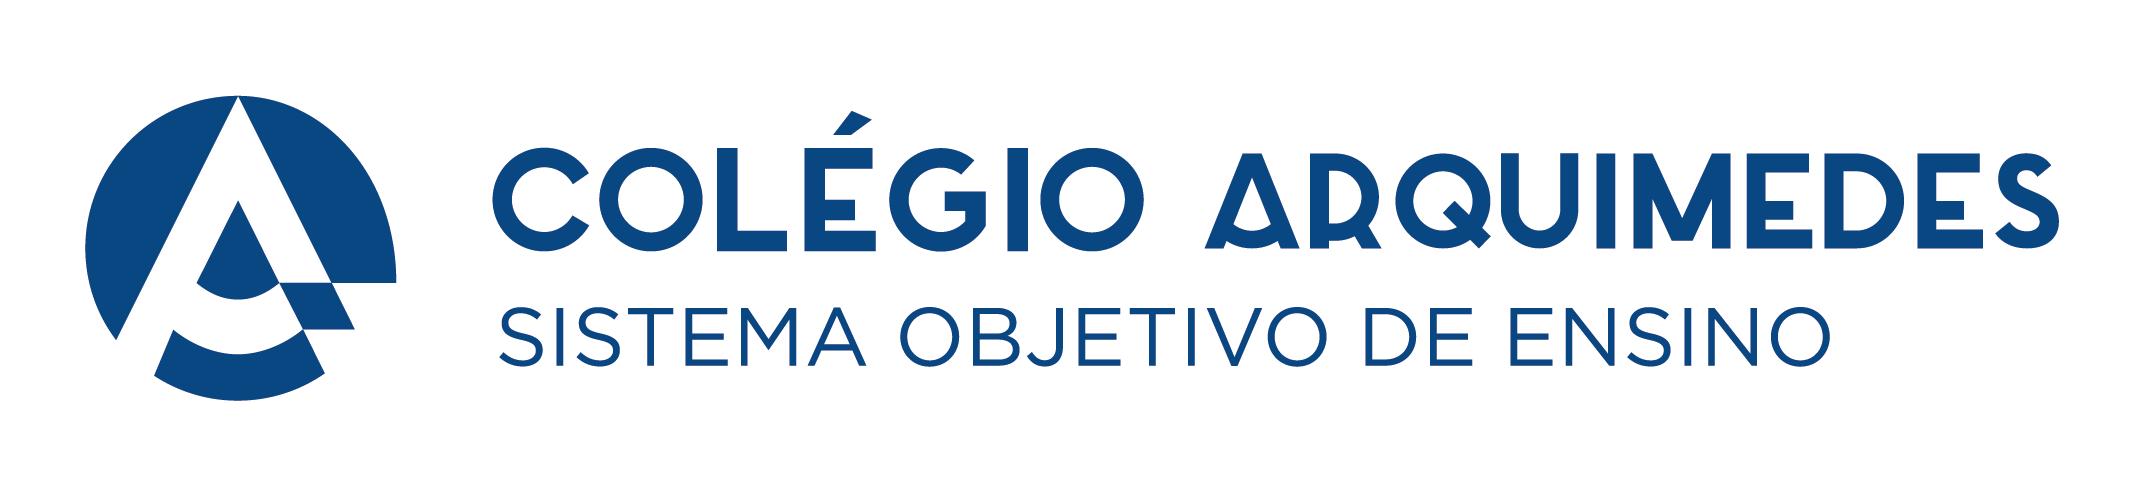 Colégio Arquimedes - Logotipo_Prancheta 1